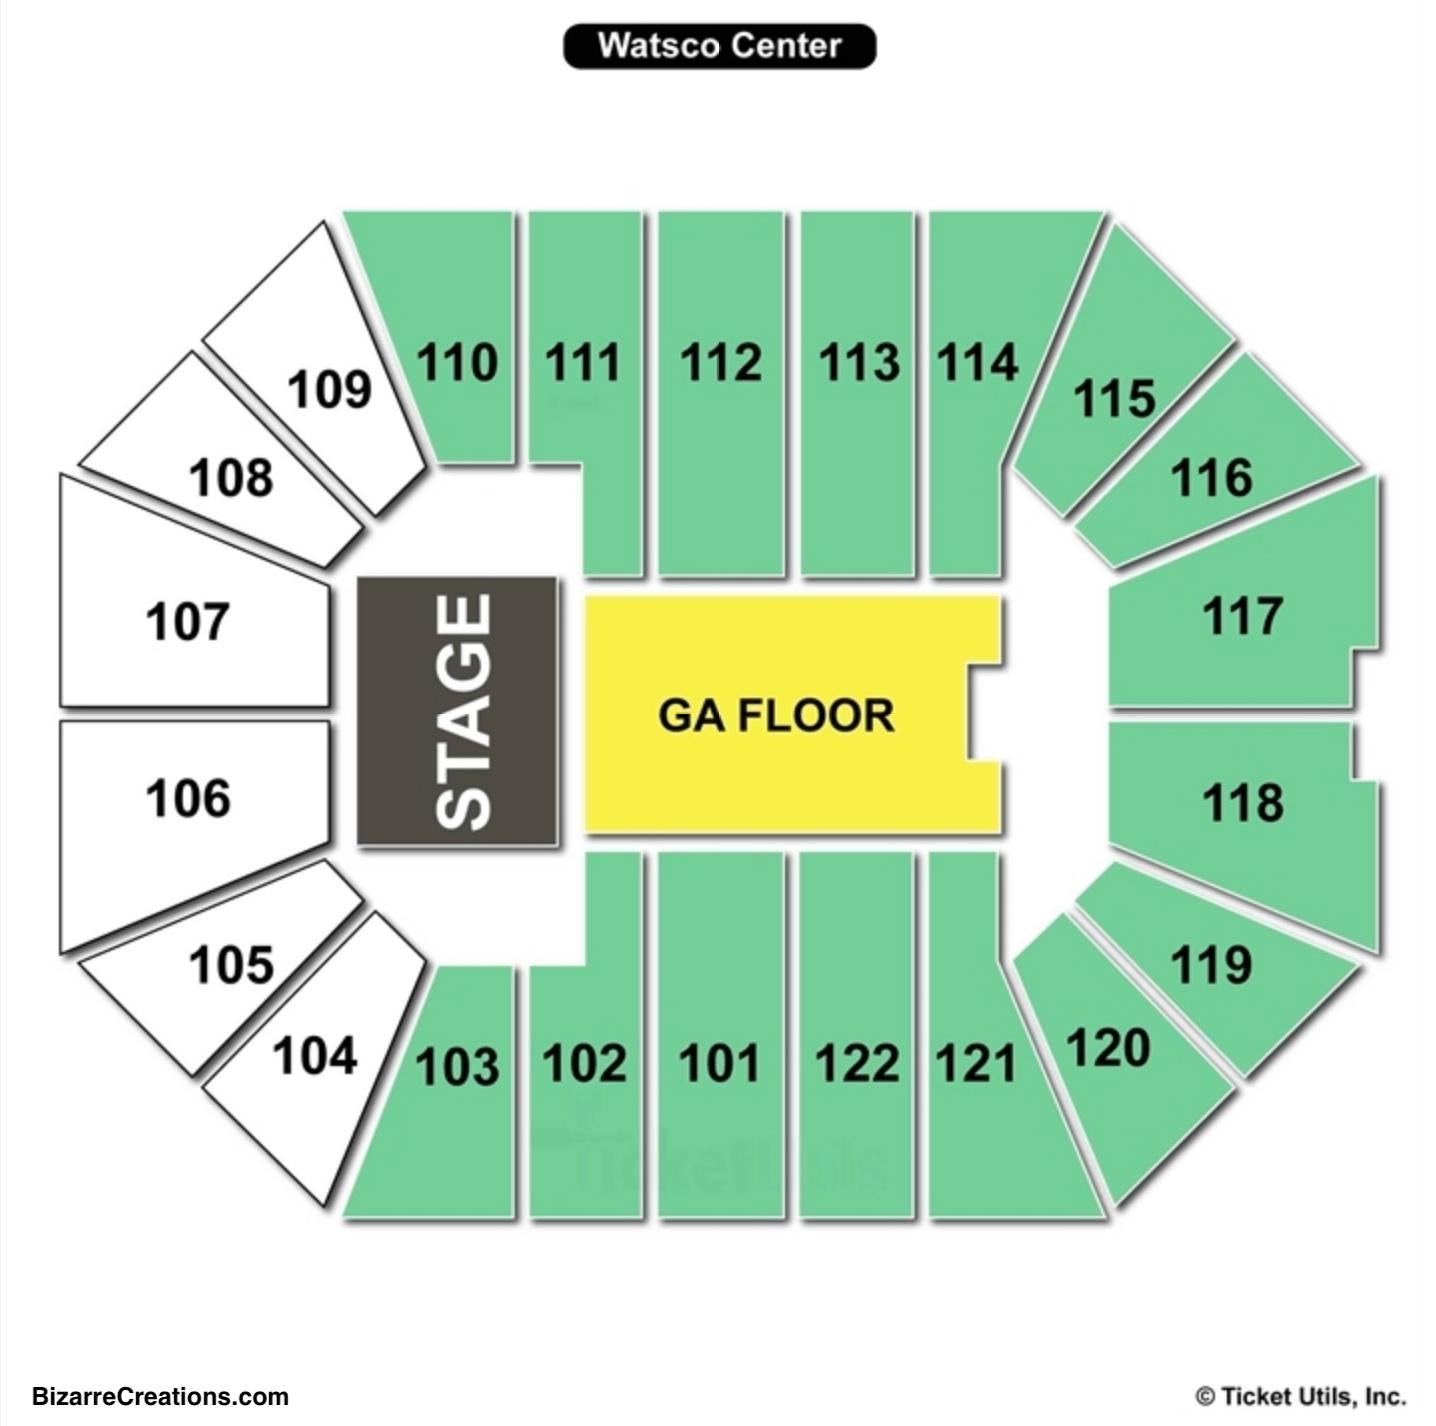 Watsco Center Concert Seating Chart